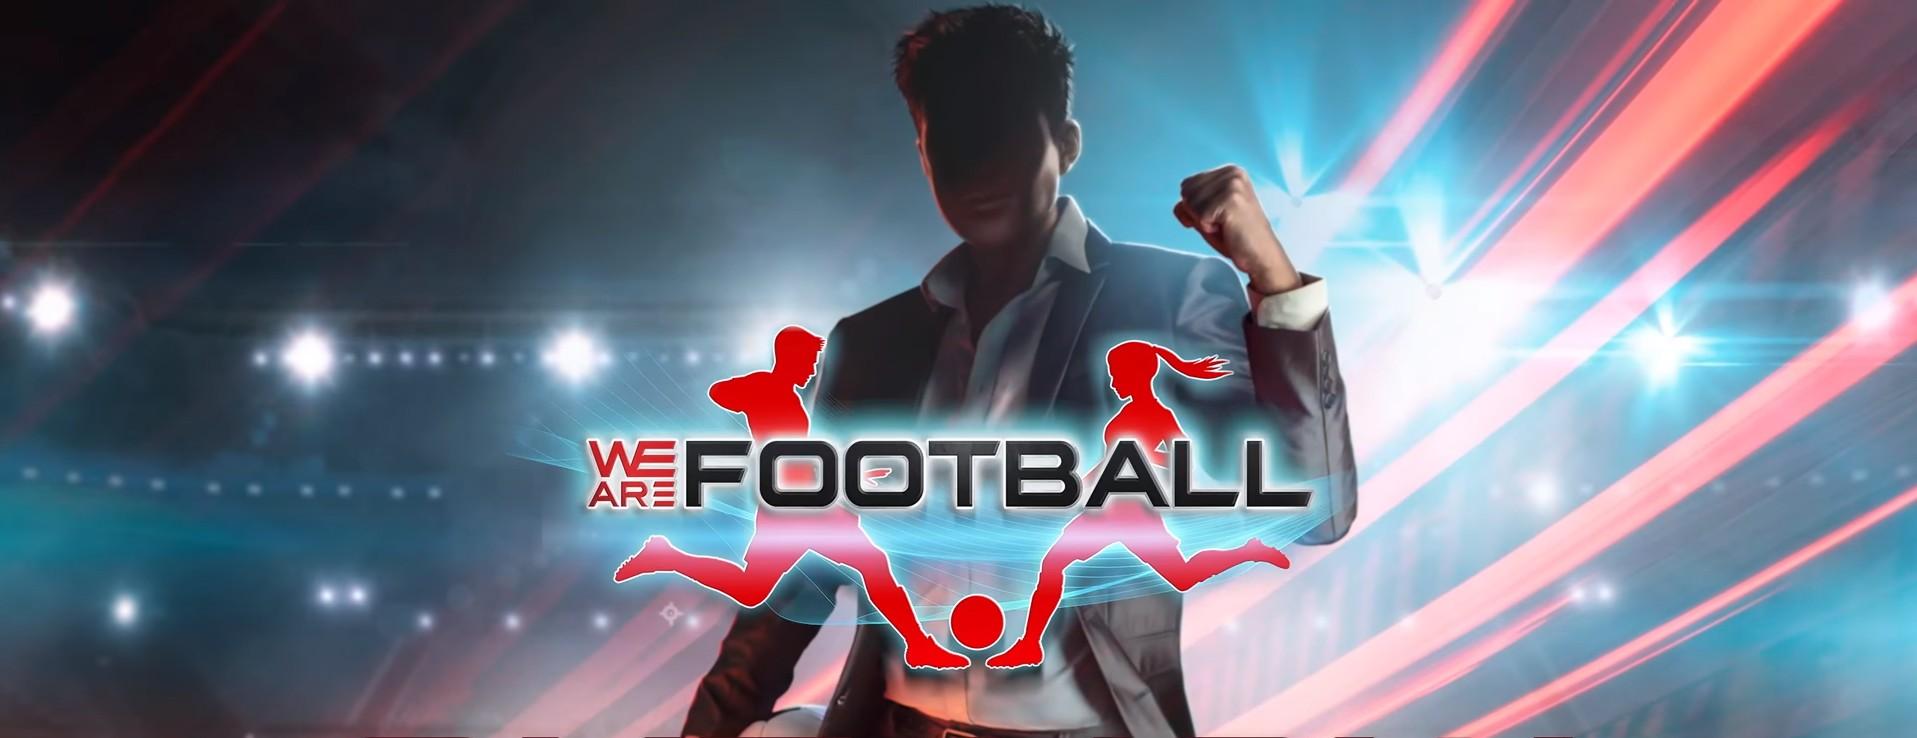 《WE ARE FOOTBALL》:尚不足以说服我放弃更主流的冠军足球经理